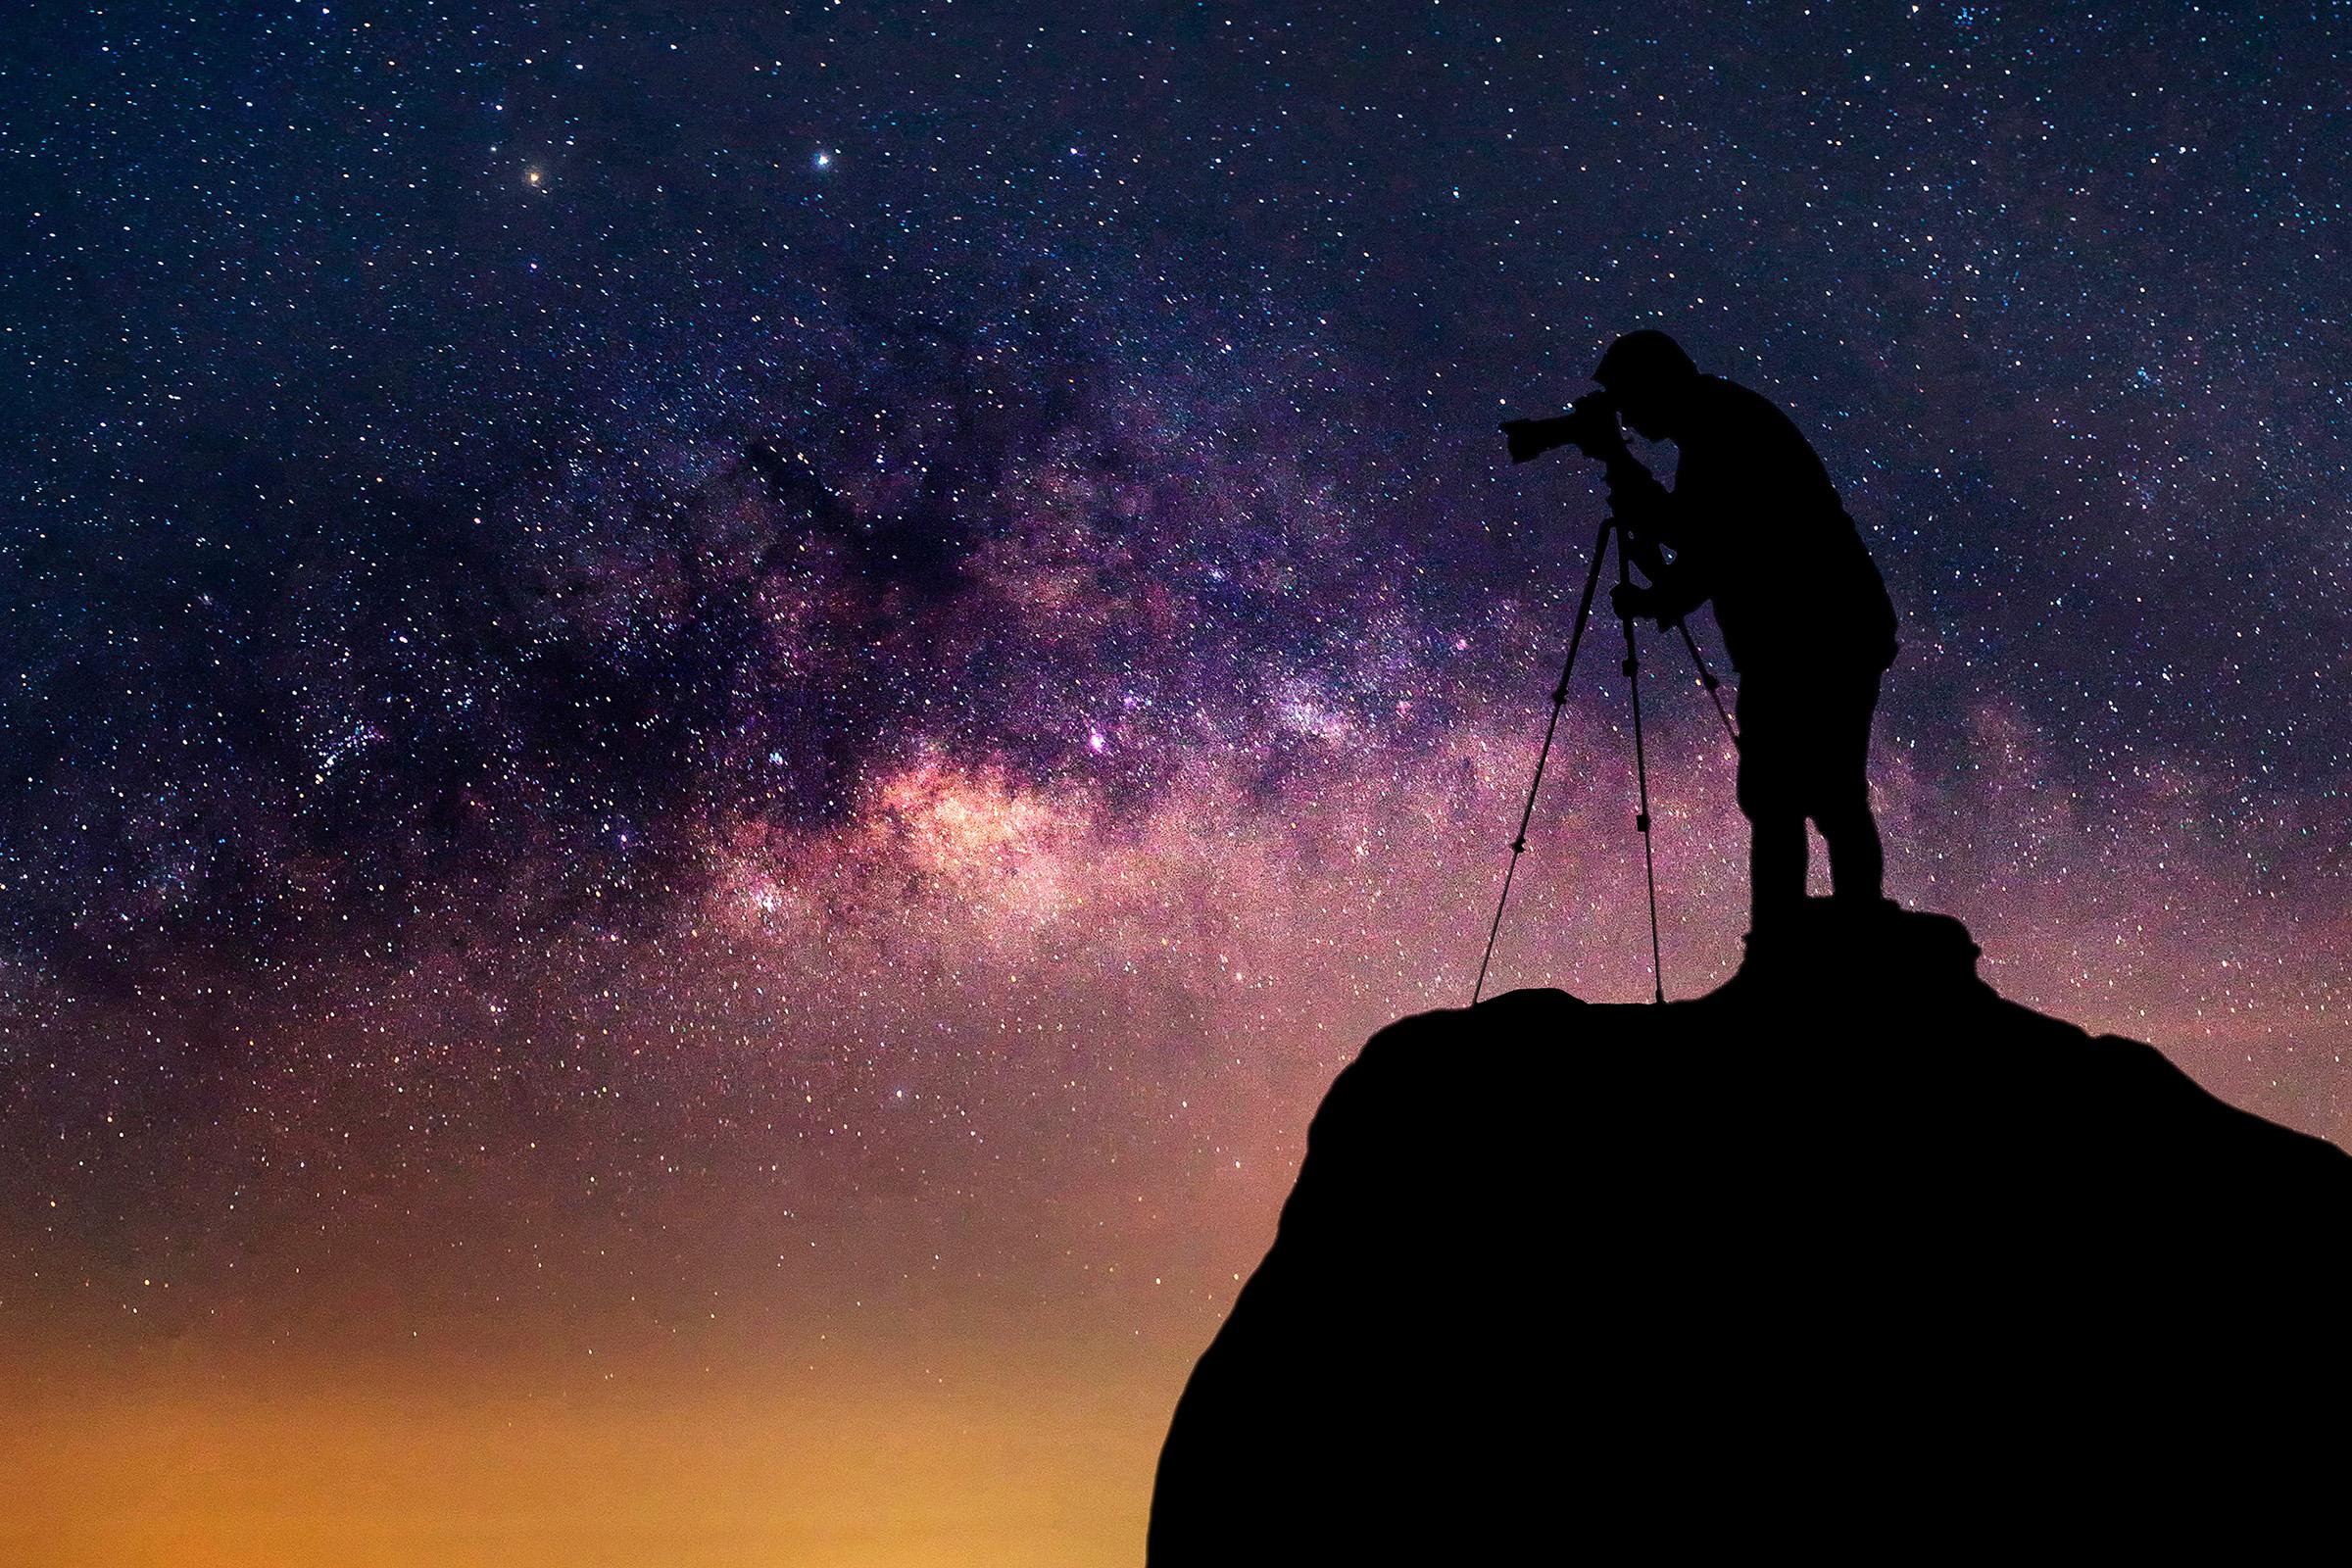 Man with camera shooting the night sky